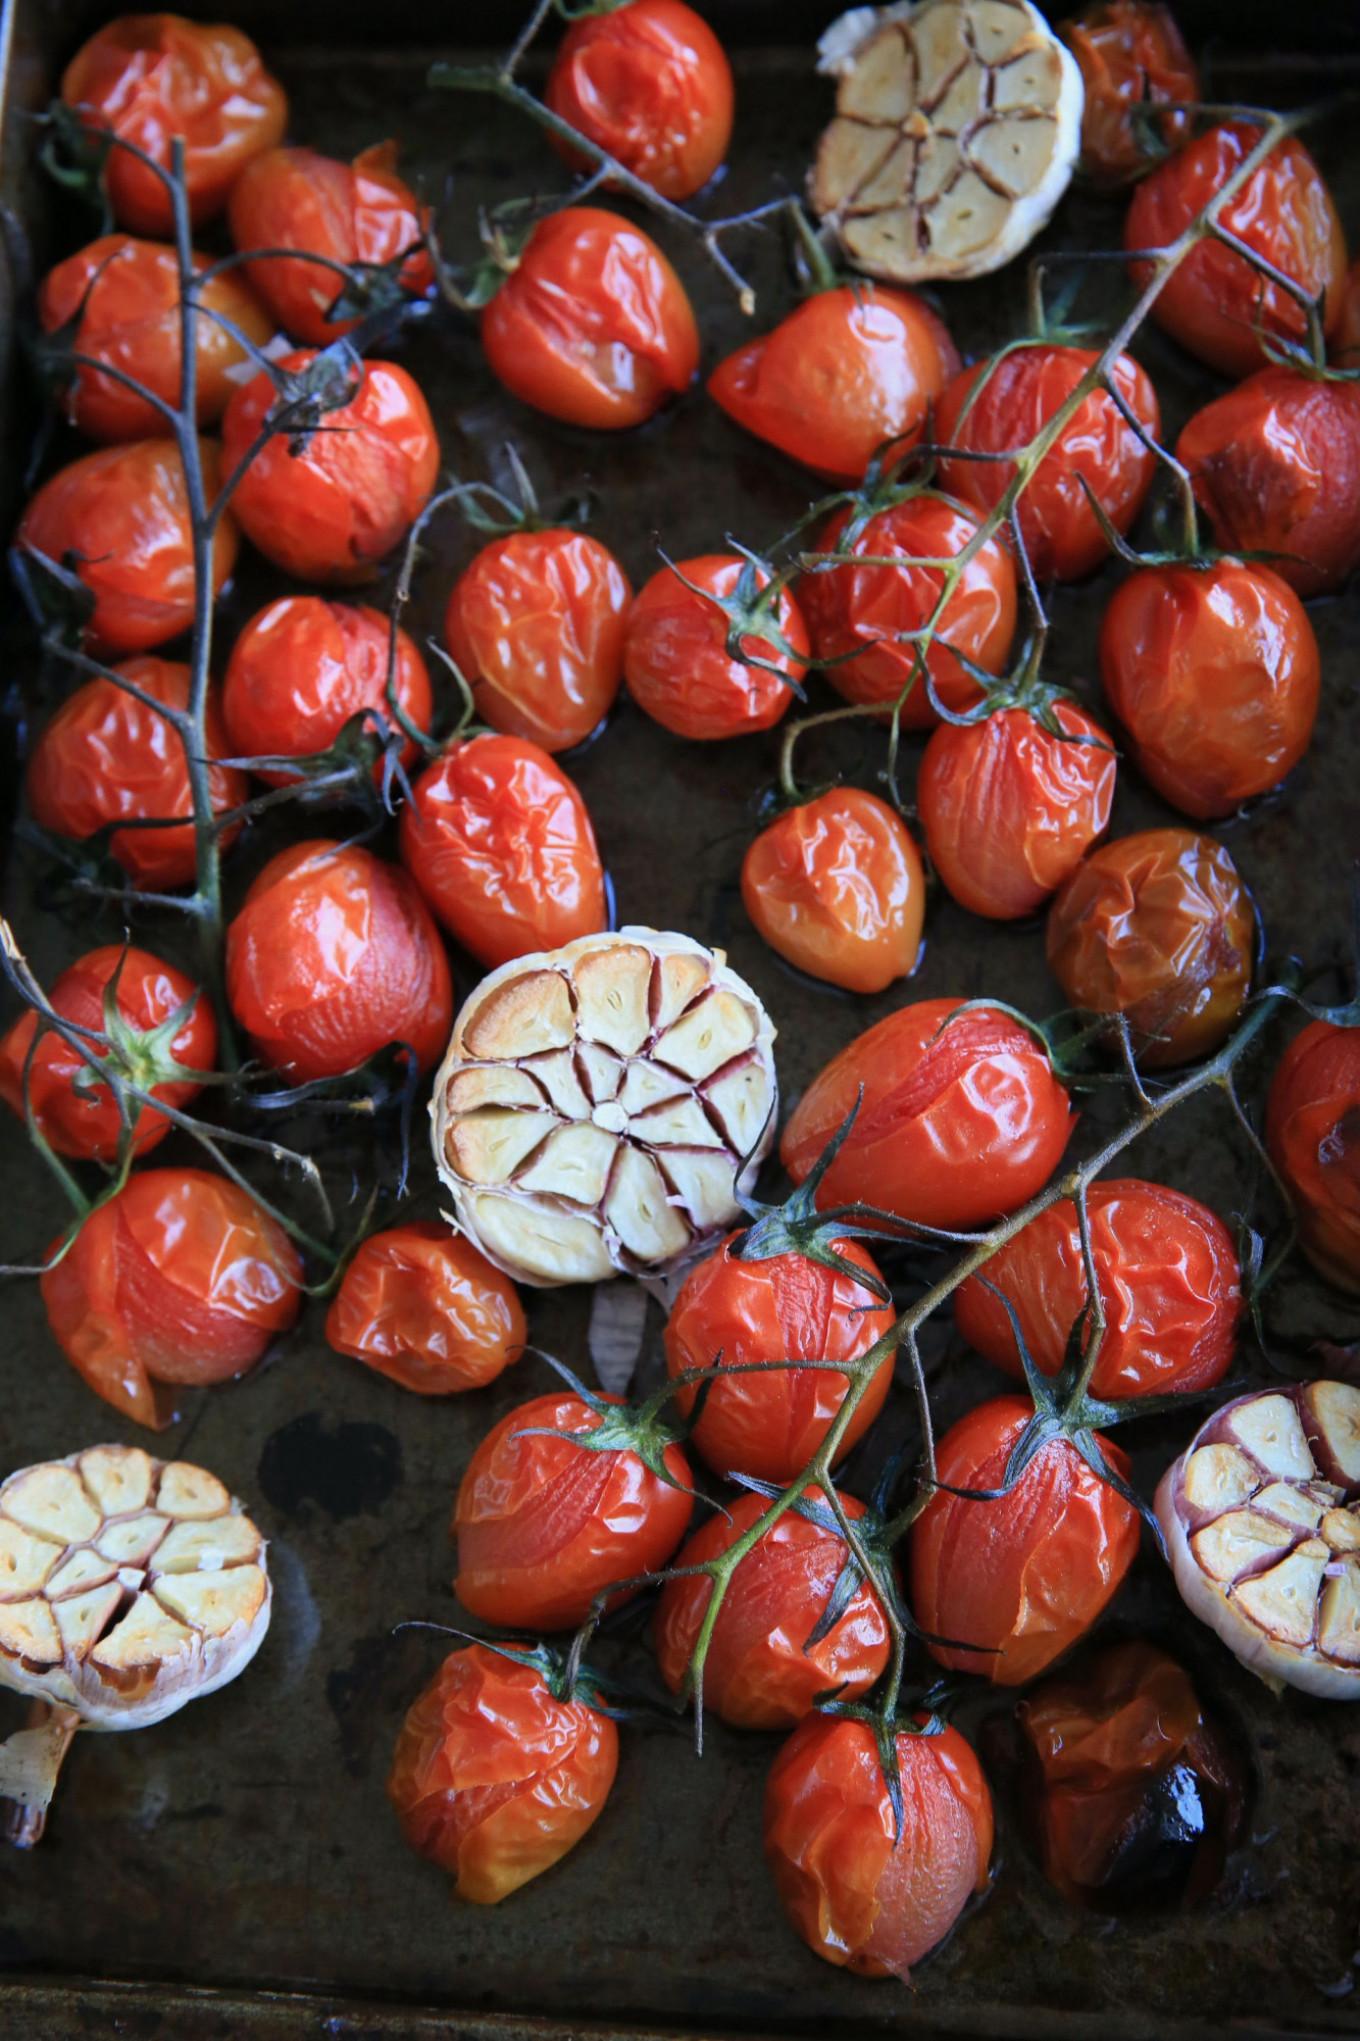 Roasted tomatoes and garlic bring depth of flavor Jennifer Eremeeva / MT